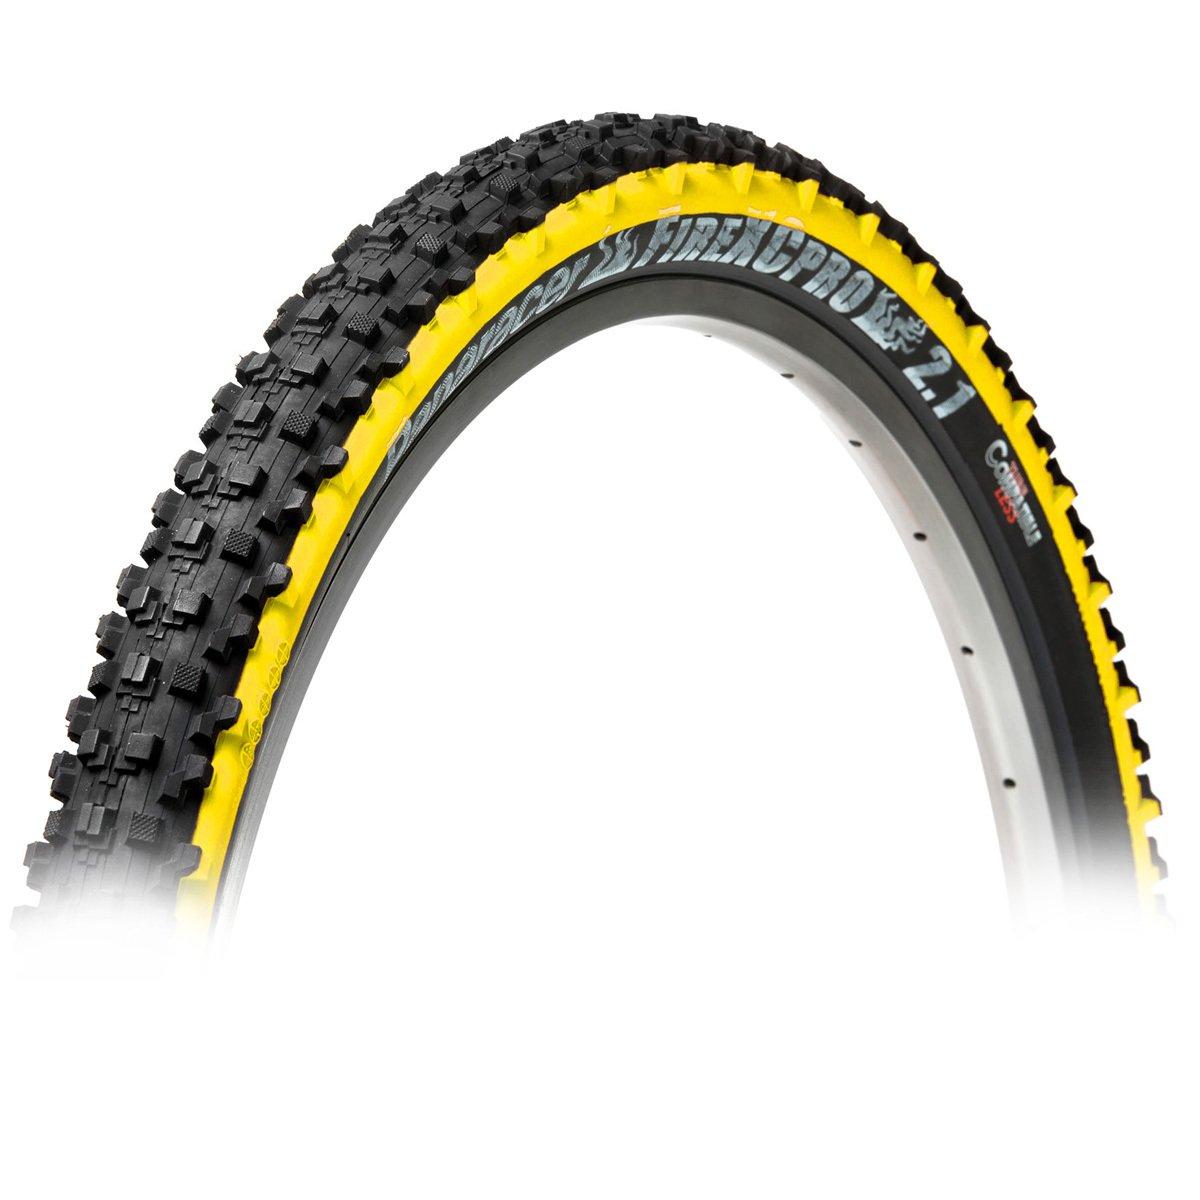 Panaracer Fire XC Pro Plegable MTB neumáticos, Unisex, Fire XC Pro Folding MTB, Negro, 26 x 2.1-Inch: Amazon.es: Deportes y aire libre